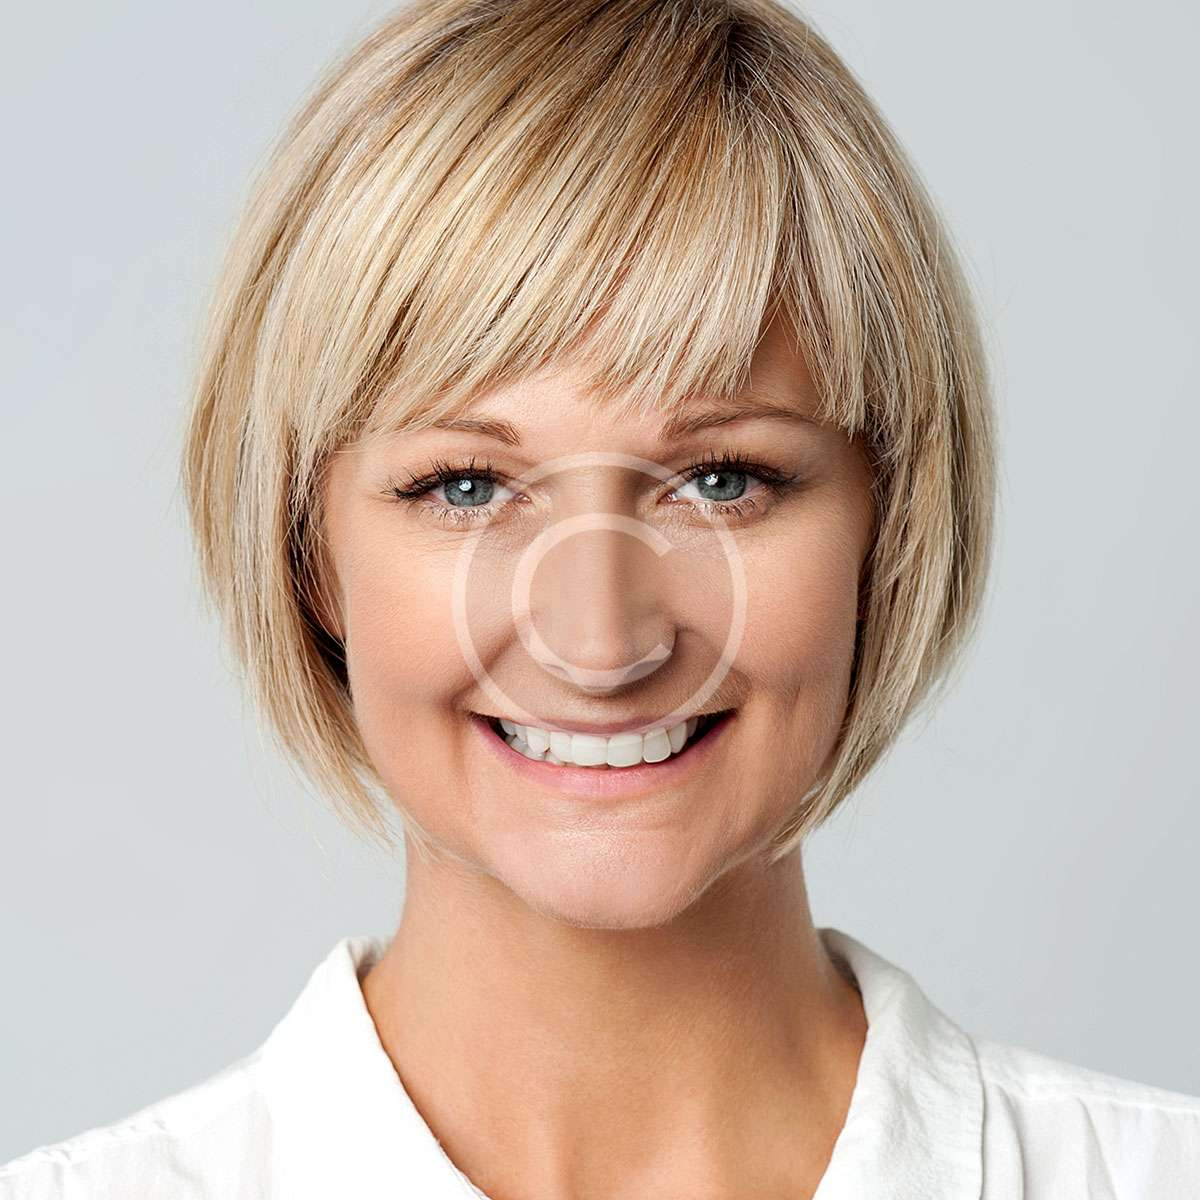 Katy Kristensen